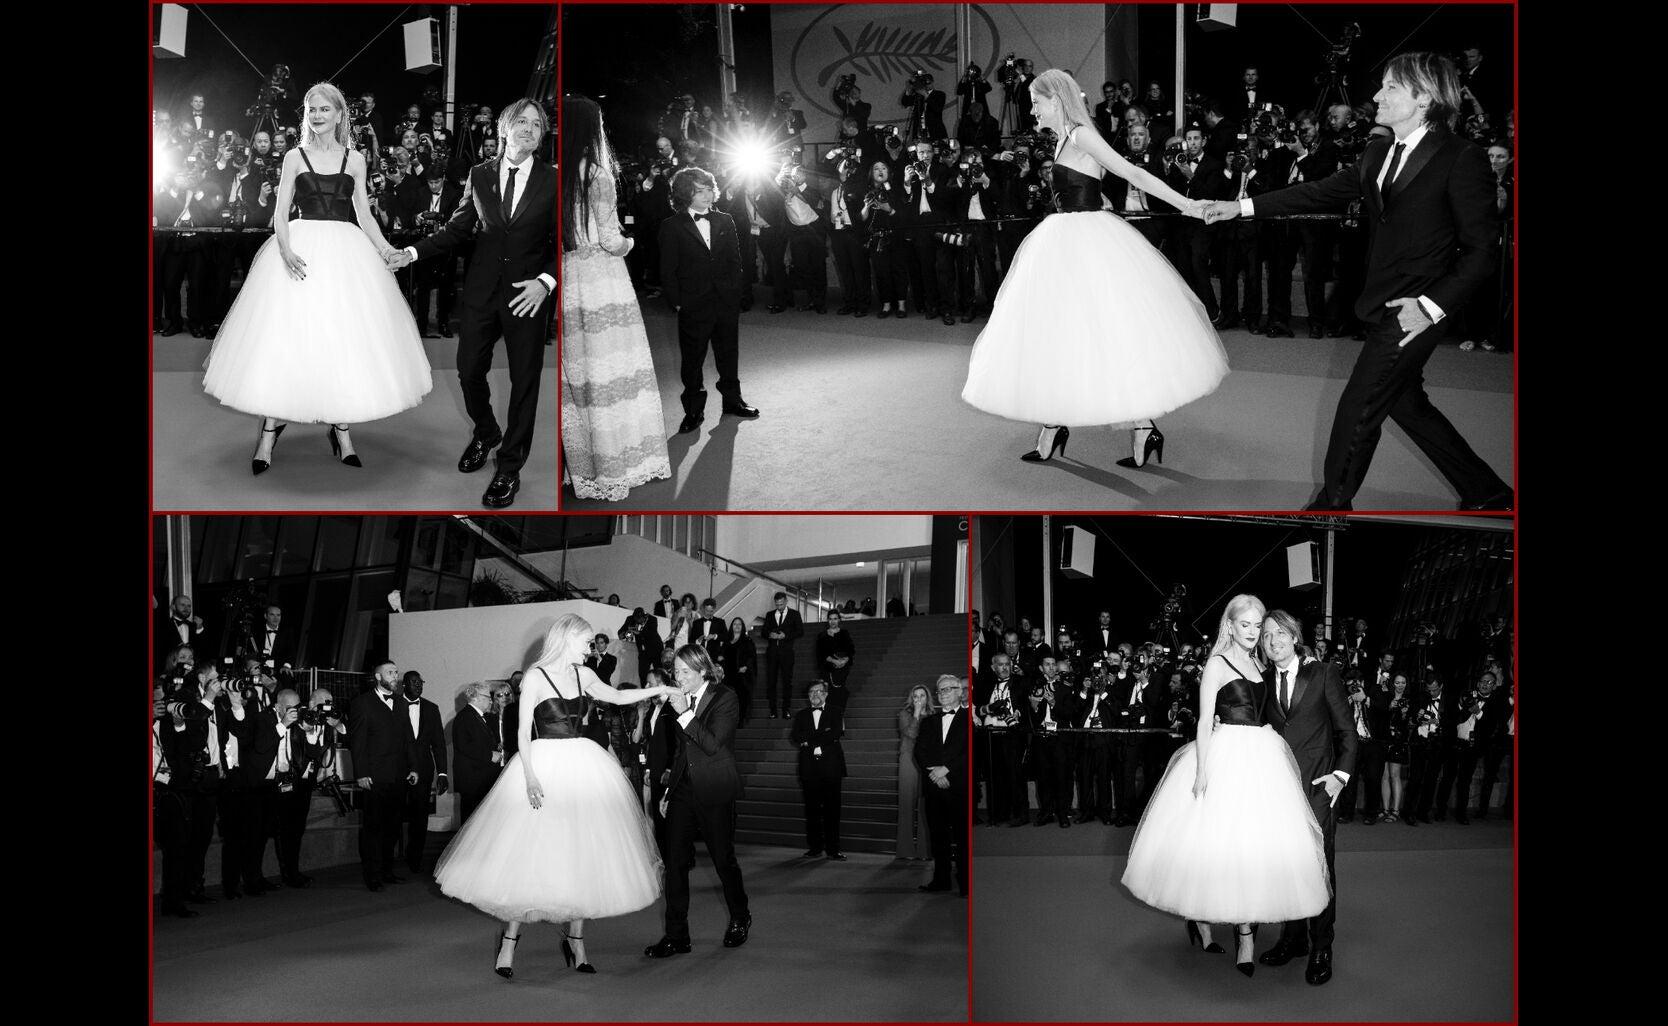 Golden Globe winner Nicole Kidman and husband Keith Urban in Cannes 2017